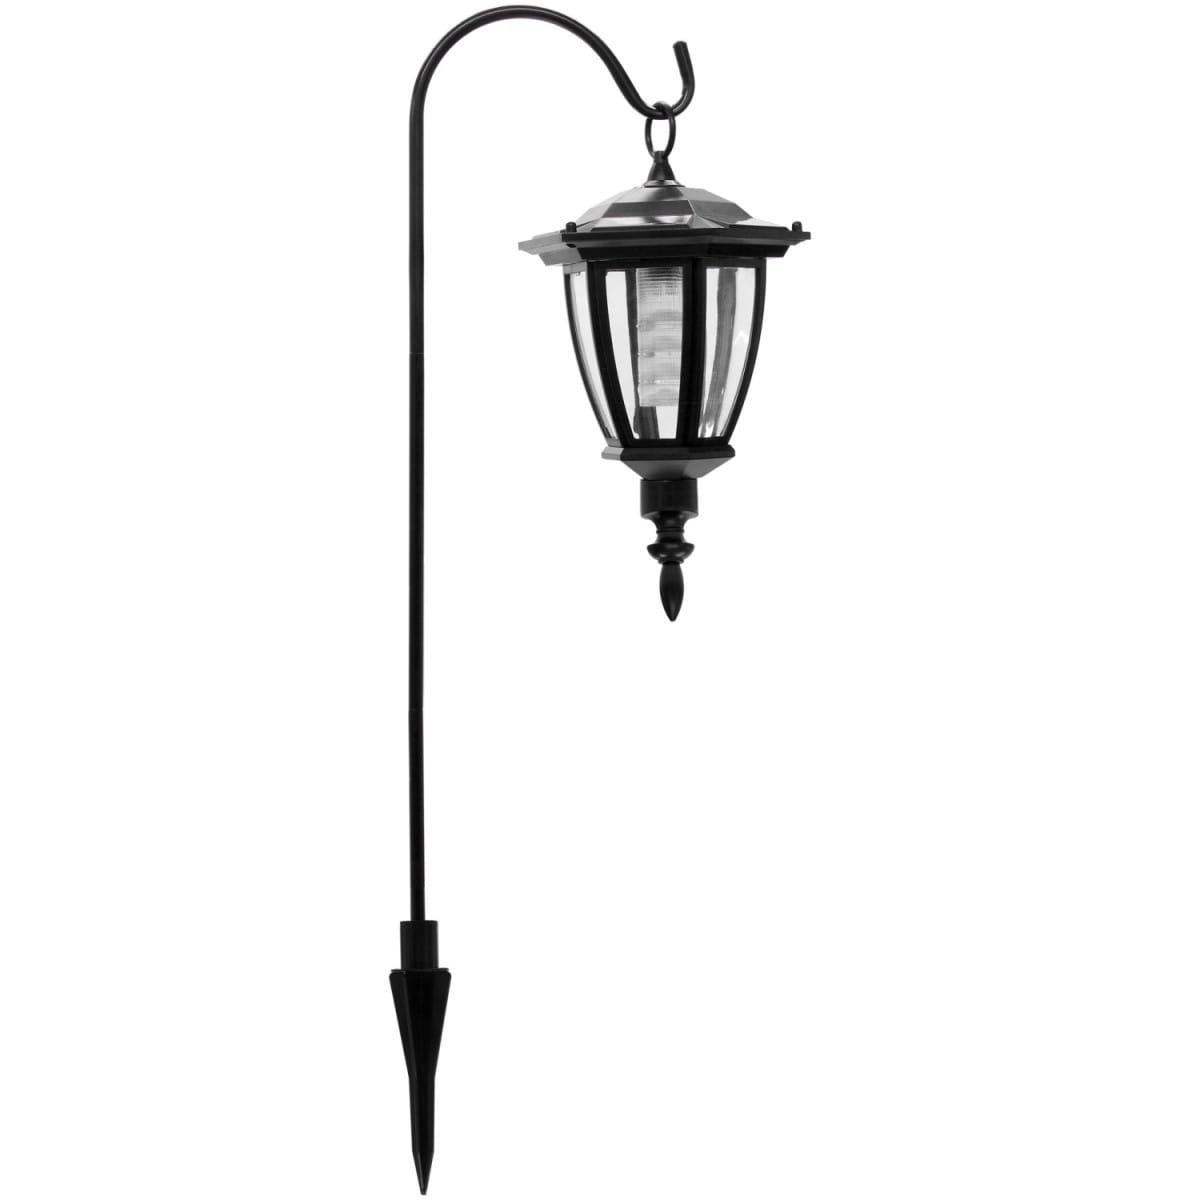 lampa solarna w kszta cie latarni 78 cm sklep internetowy. Black Bedroom Furniture Sets. Home Design Ideas